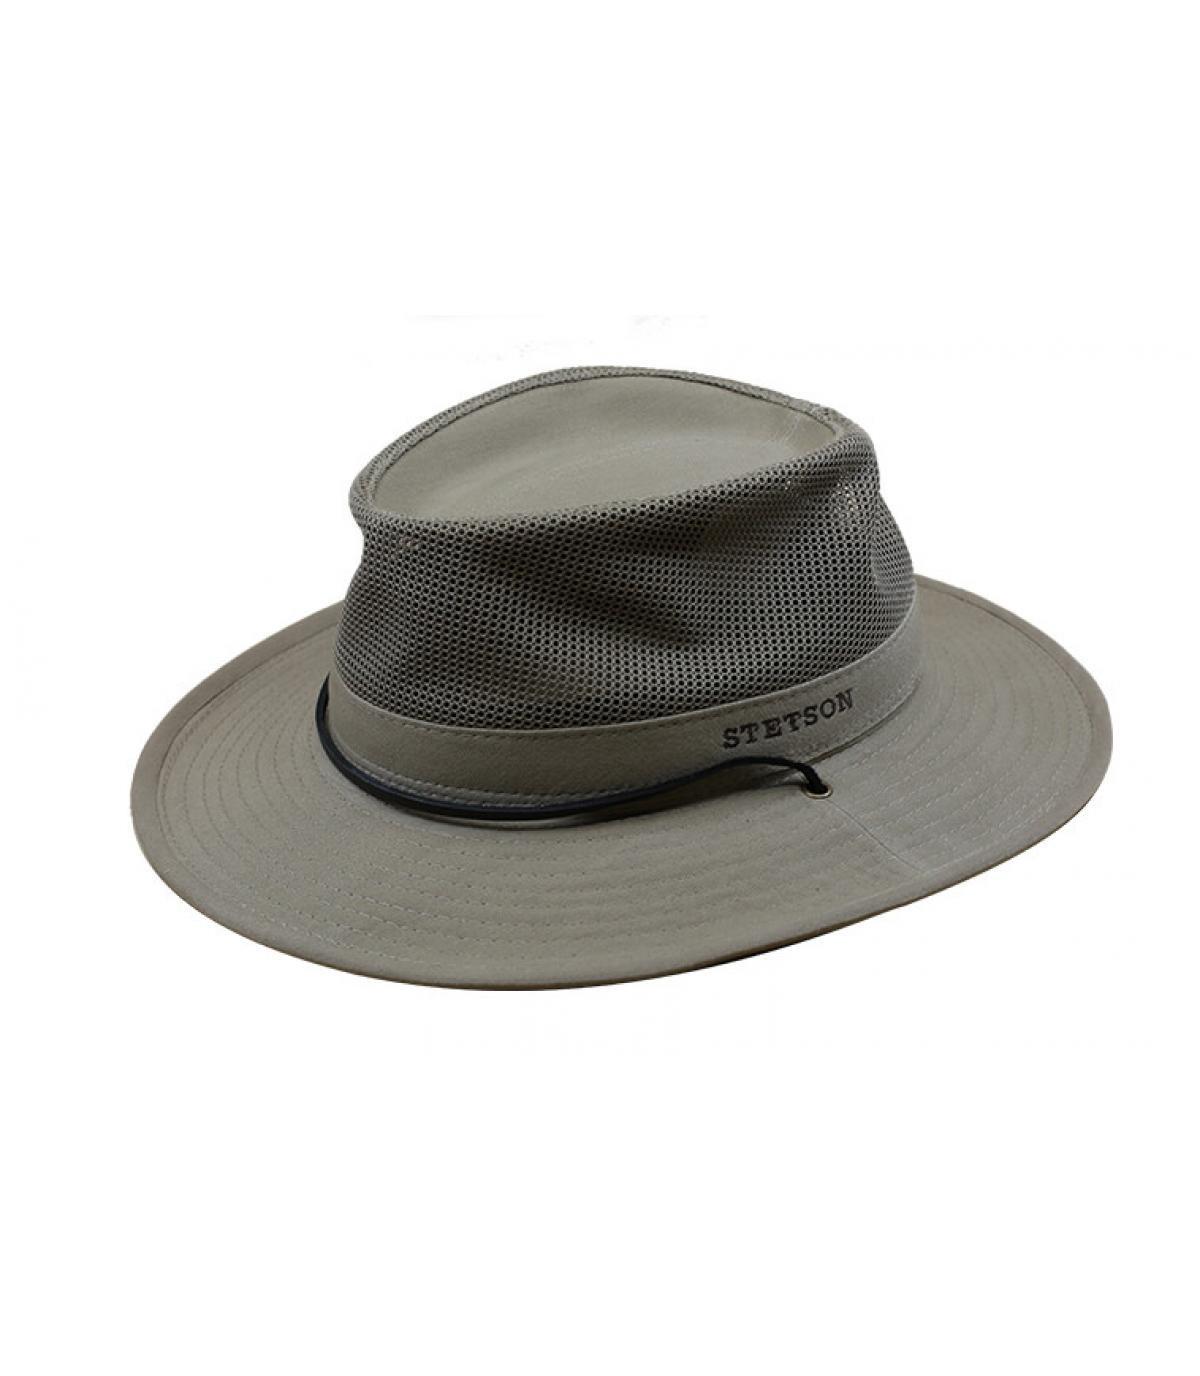 Stetson breathable hat